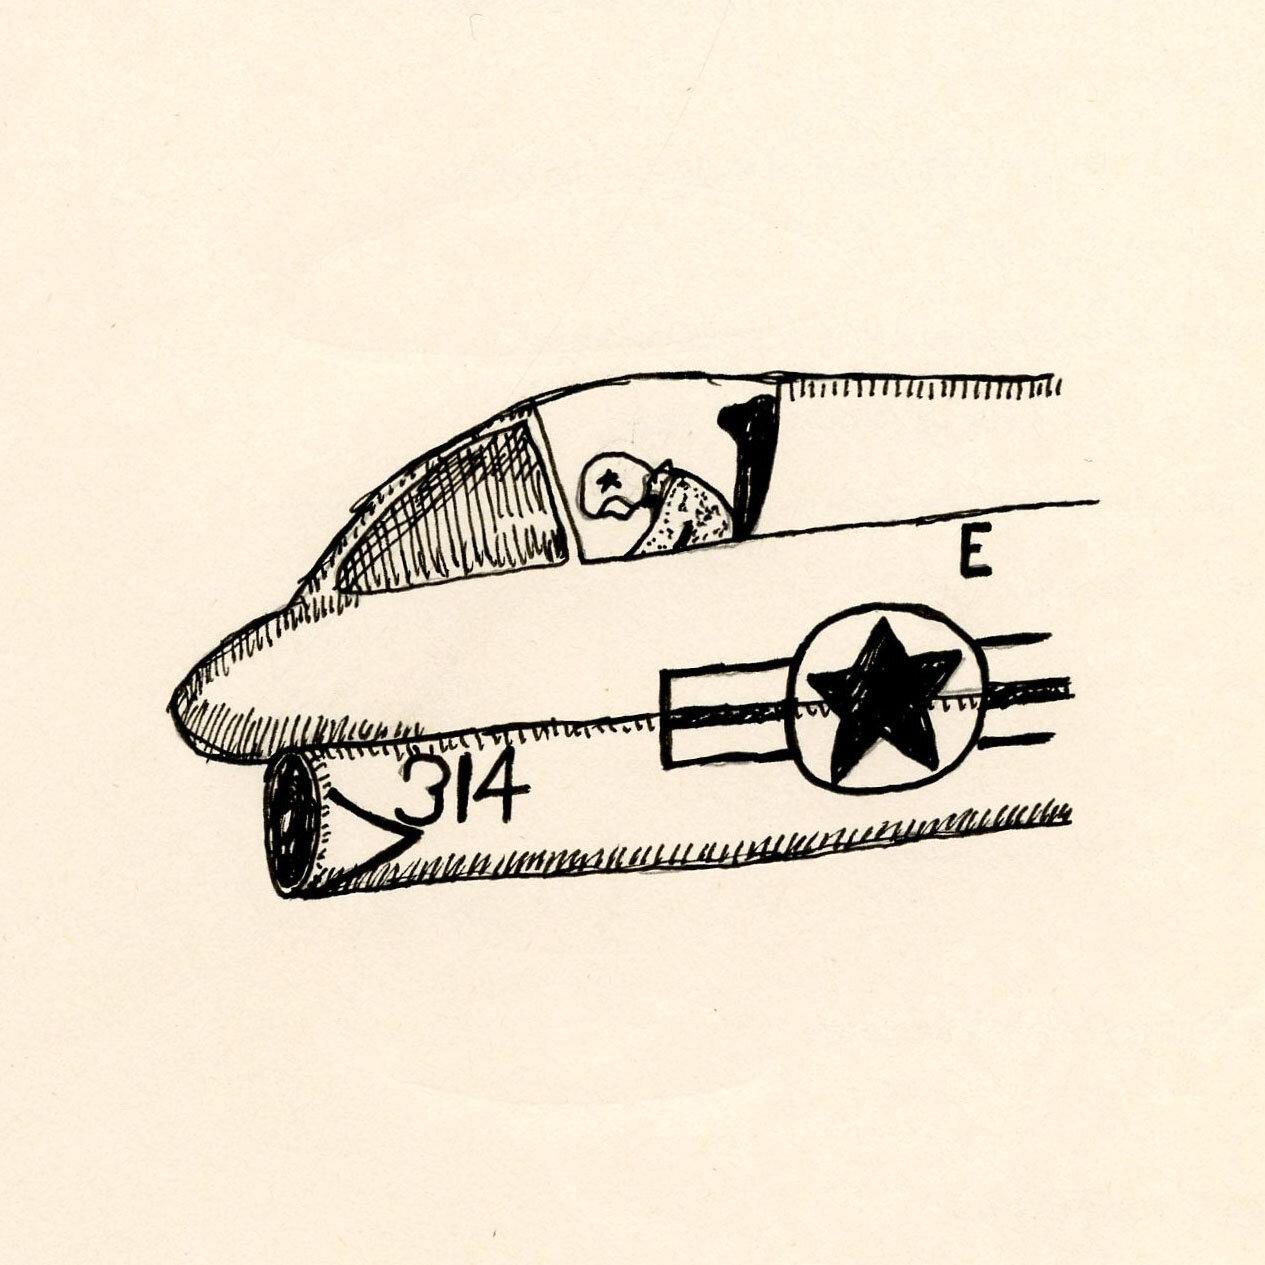 wingman-flash.jpg